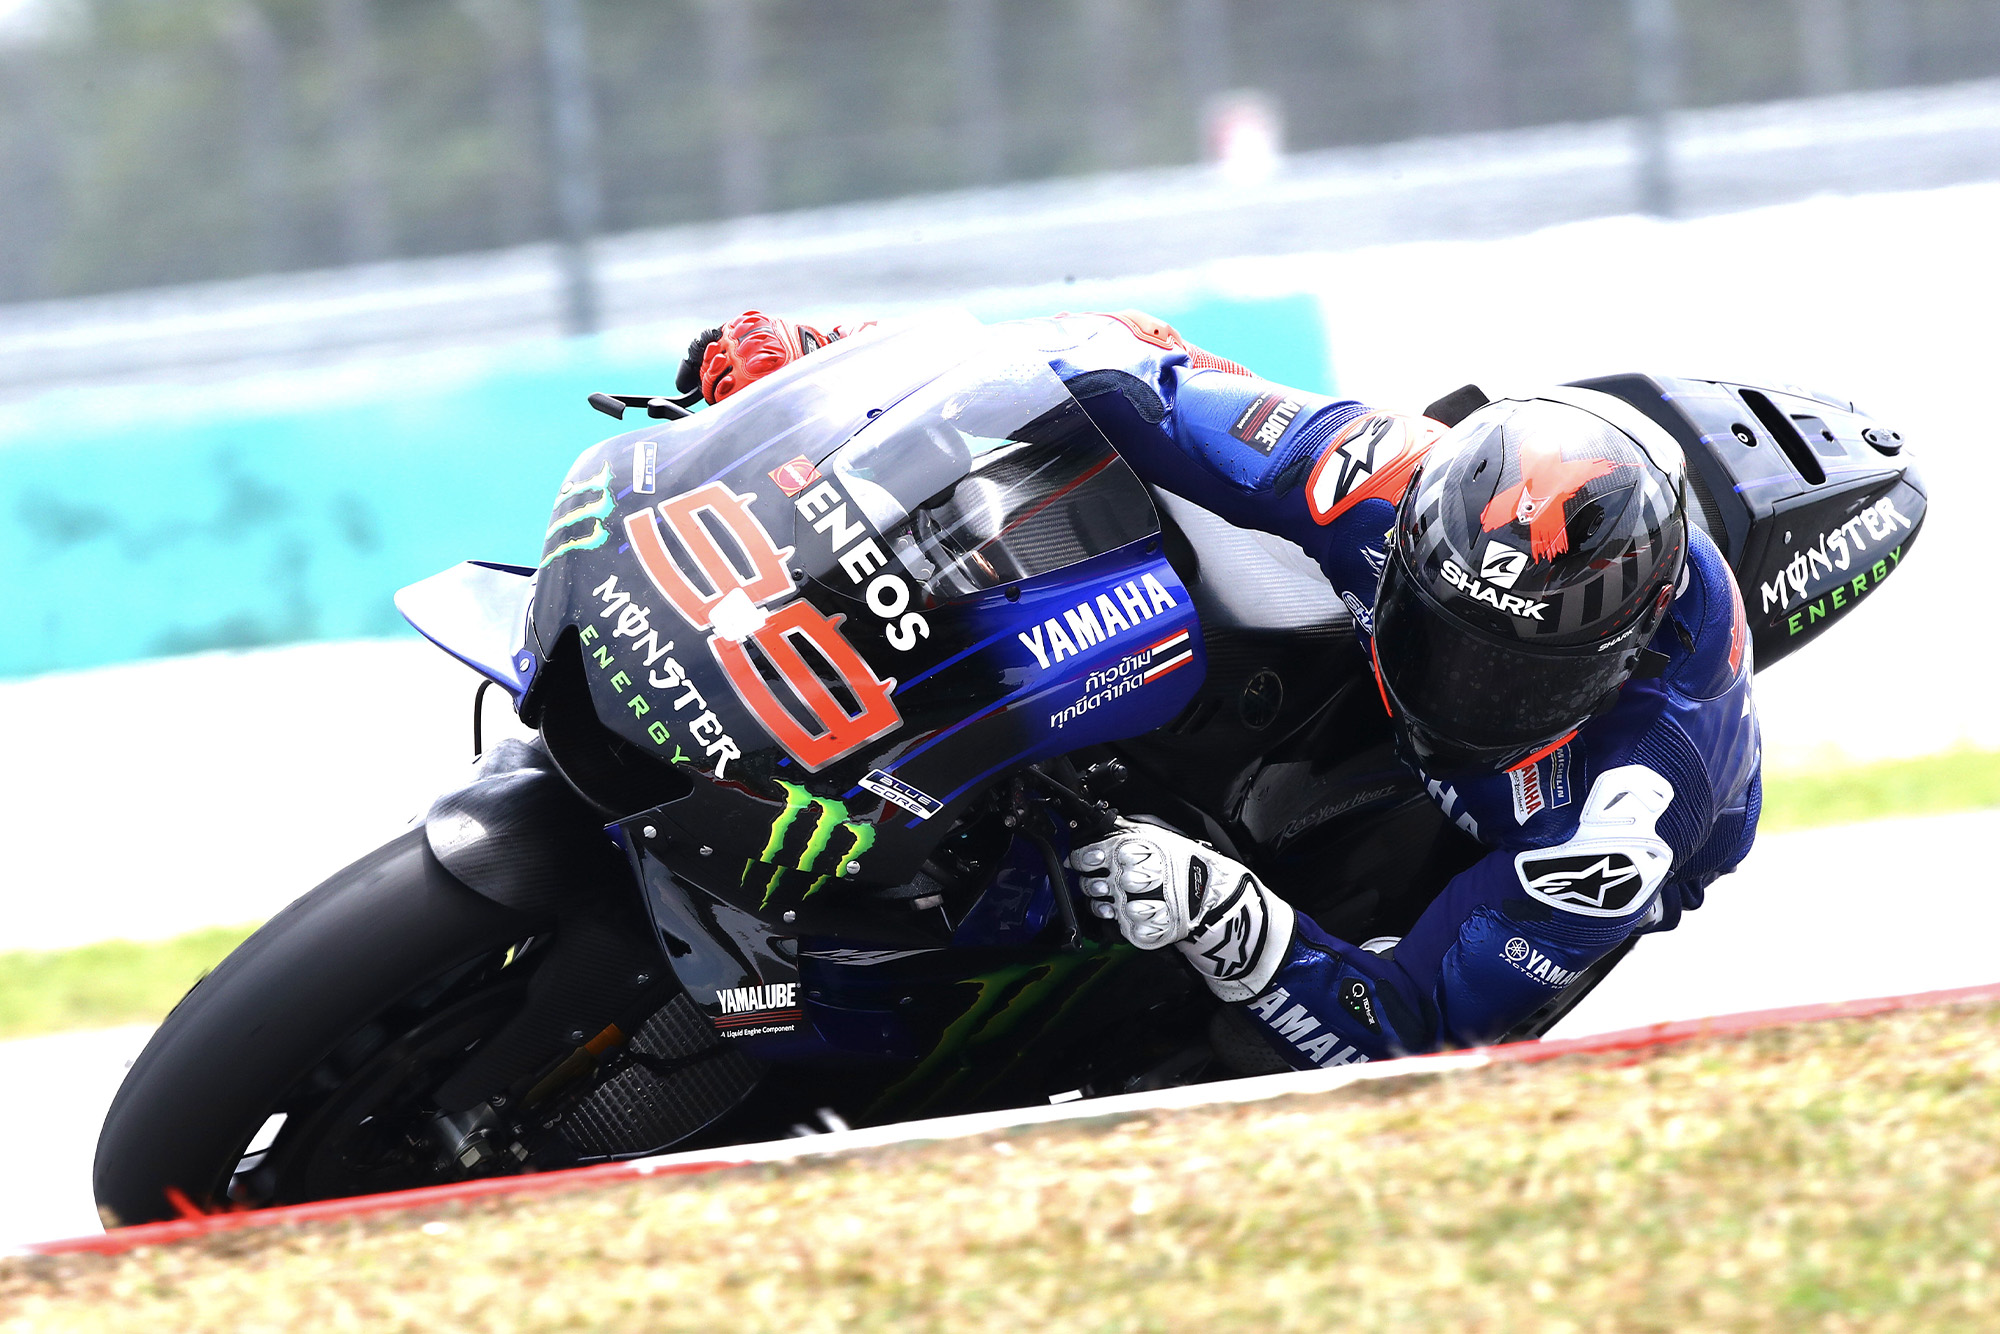 Jorge Lorenzo testing with Yamaha